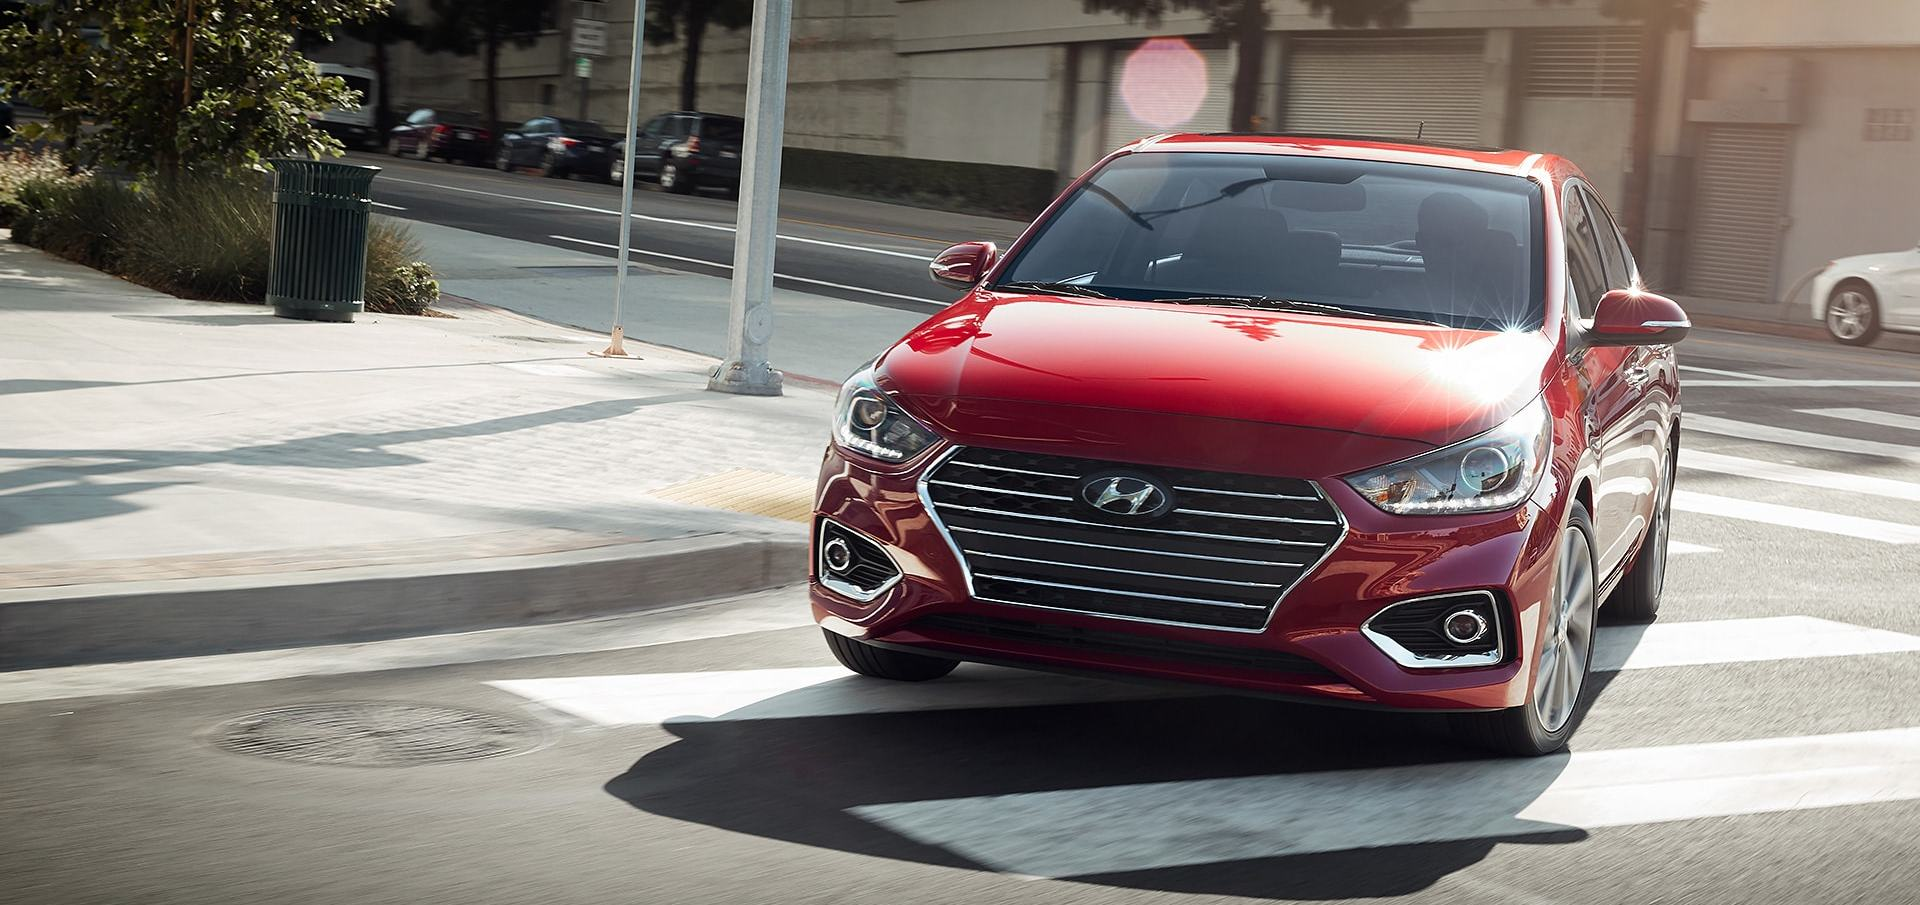 Used Hyundai Accent for Sale near Richmond, VA